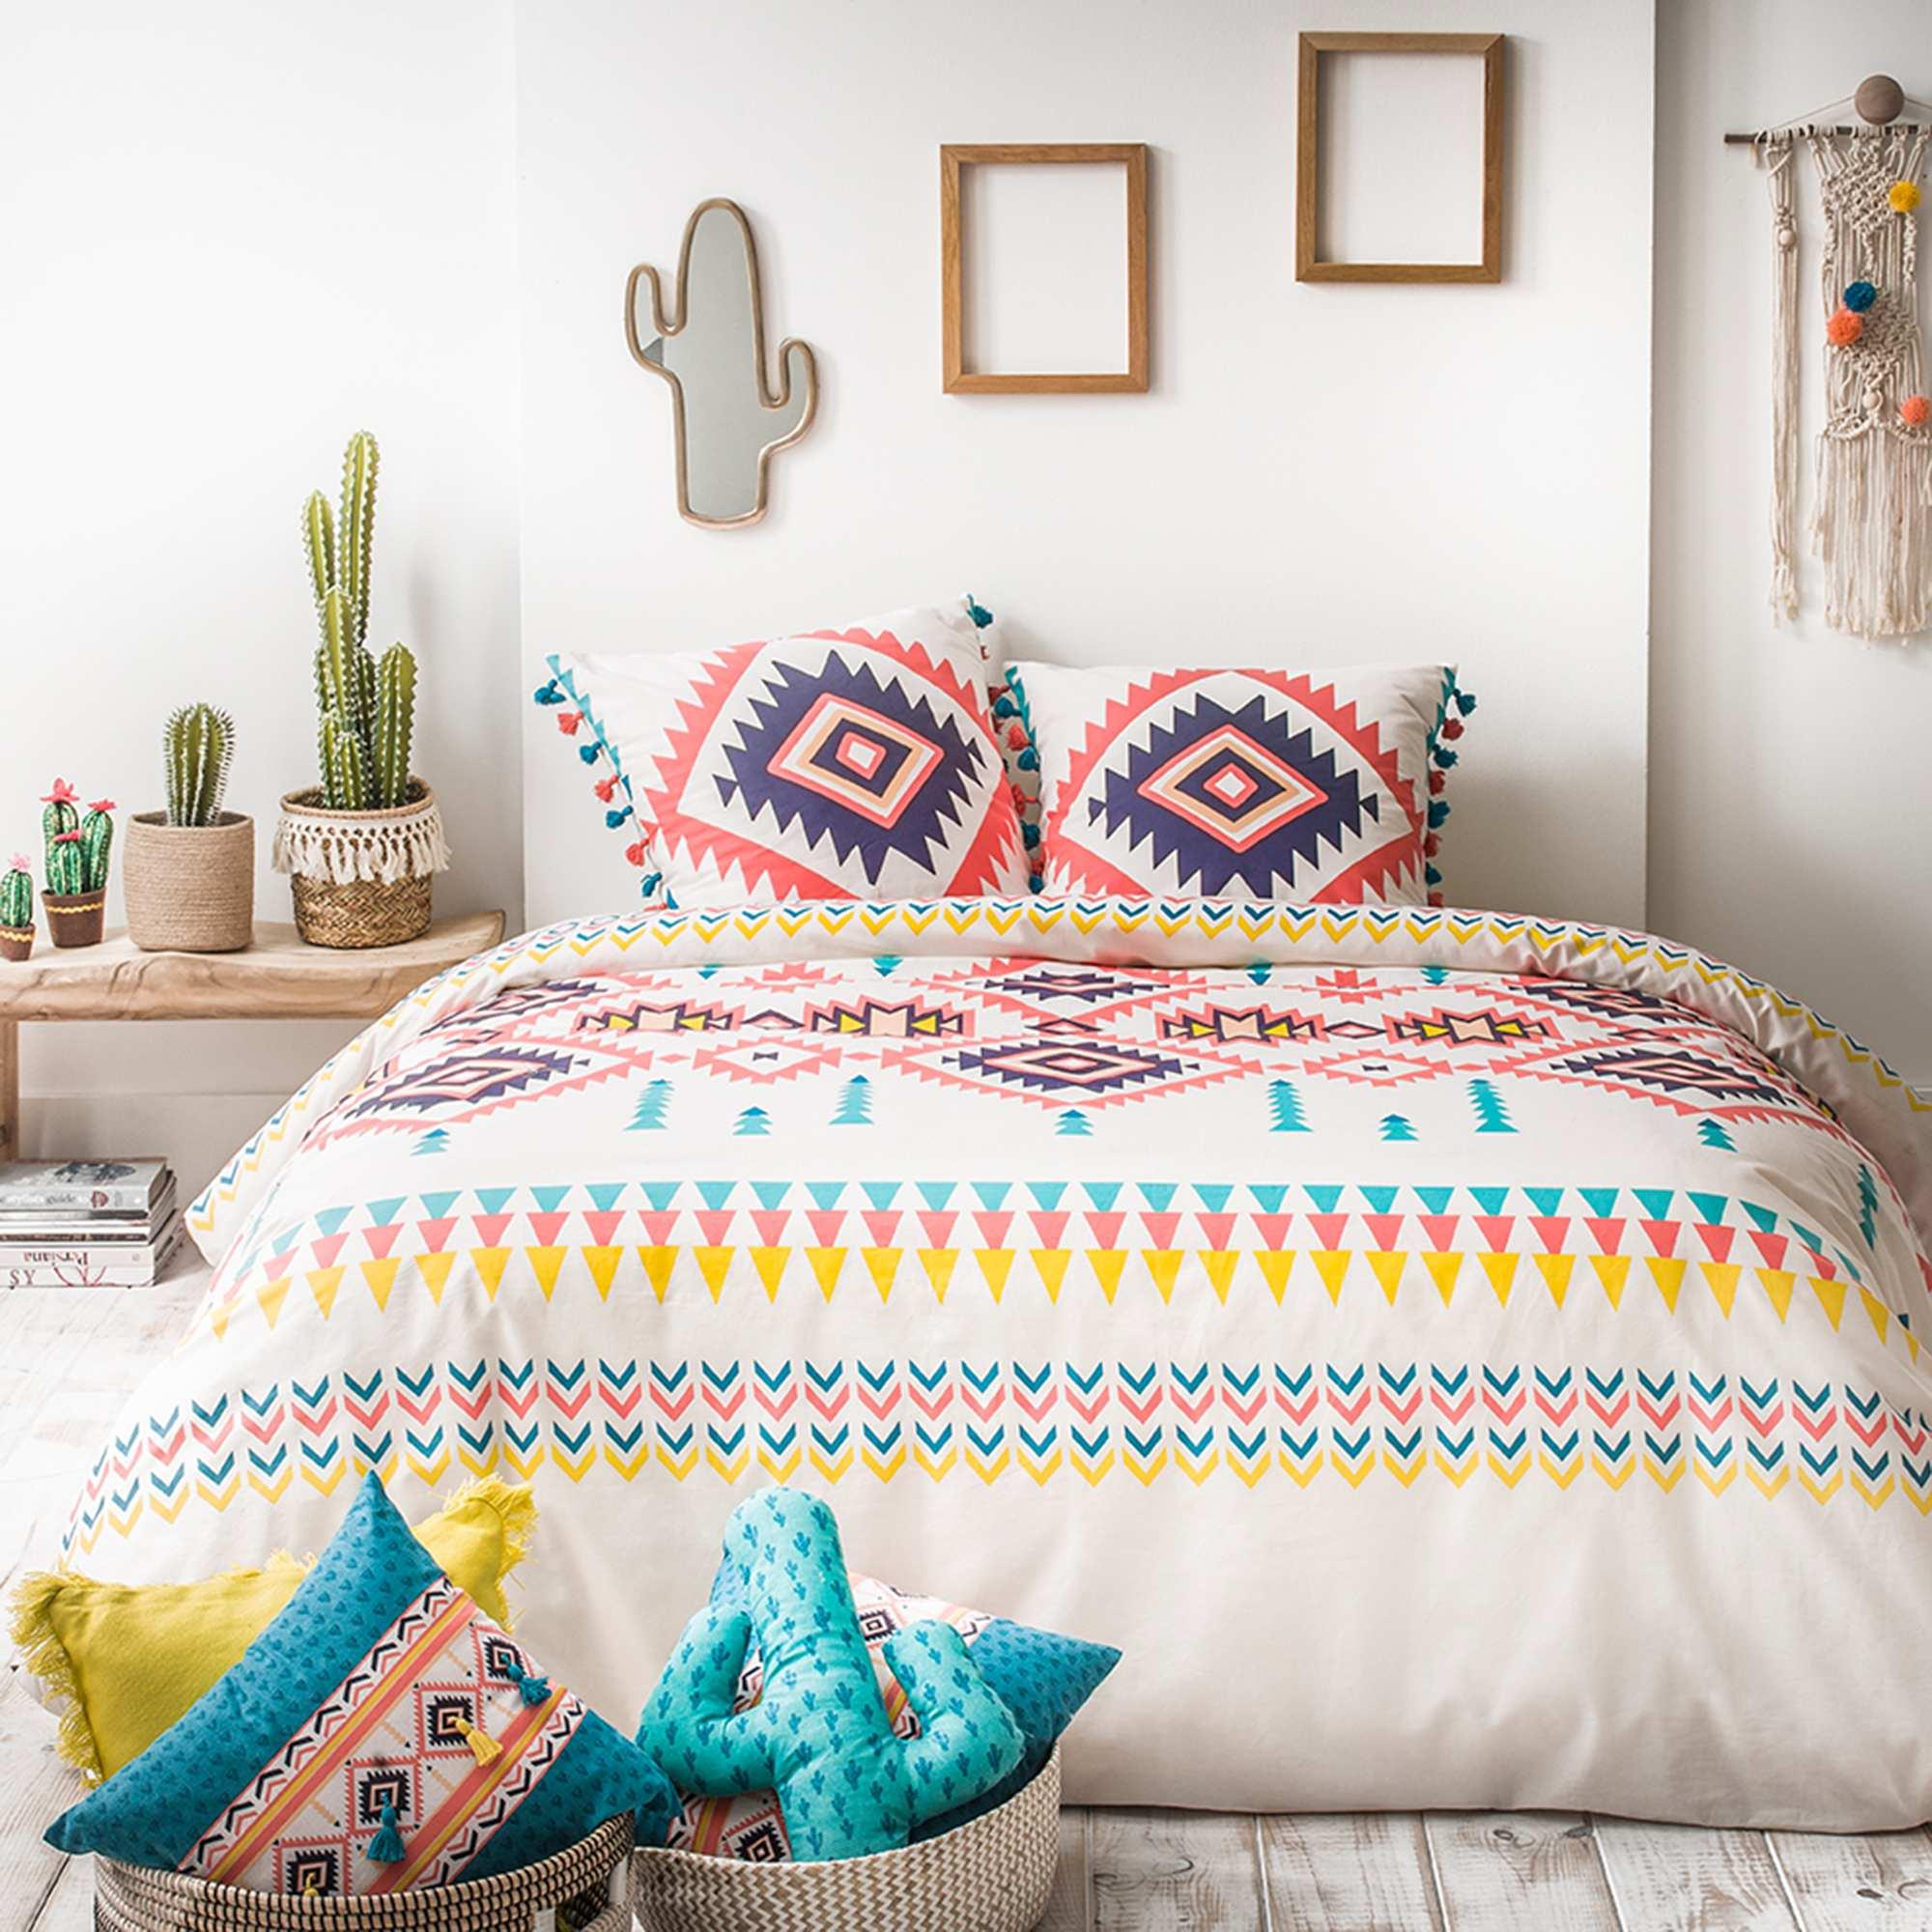 Juego de cama doble con estampado tnico hogar crudo kiabi 35 00 - Kiabi hogar ...